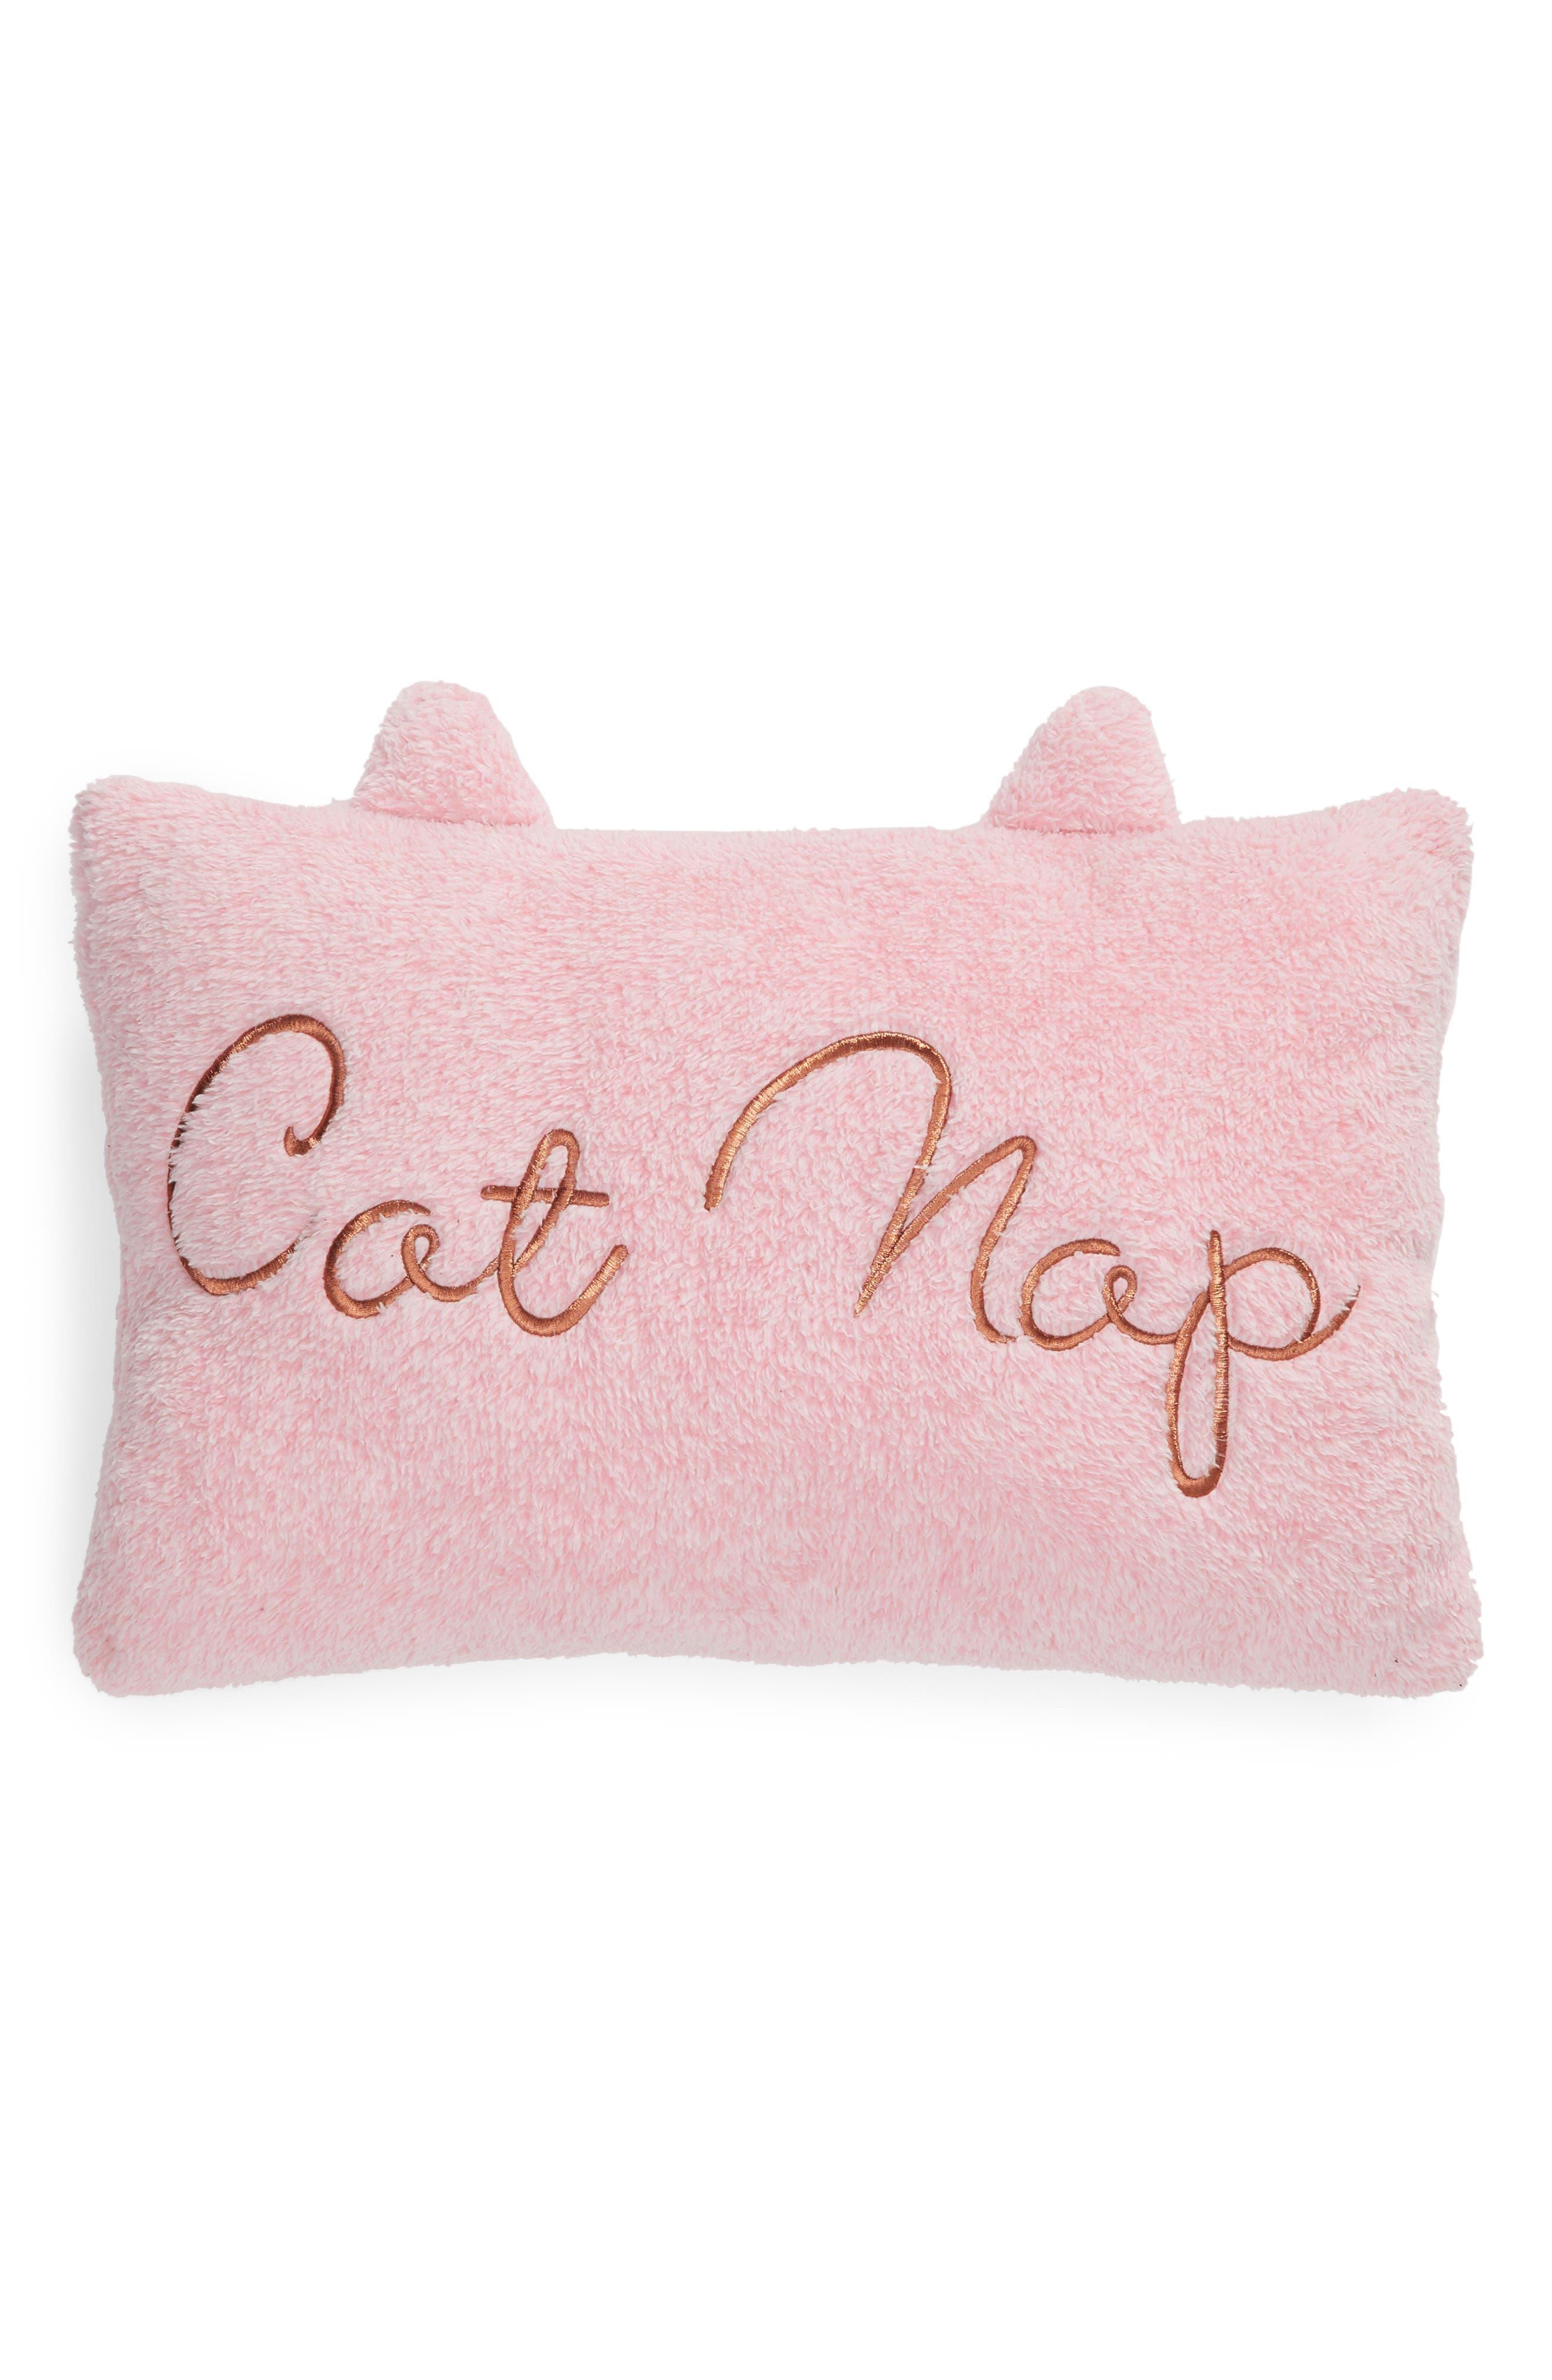 Cat Accent Pillow,                             Alternate thumbnail 2, color,                             PINK COMBO